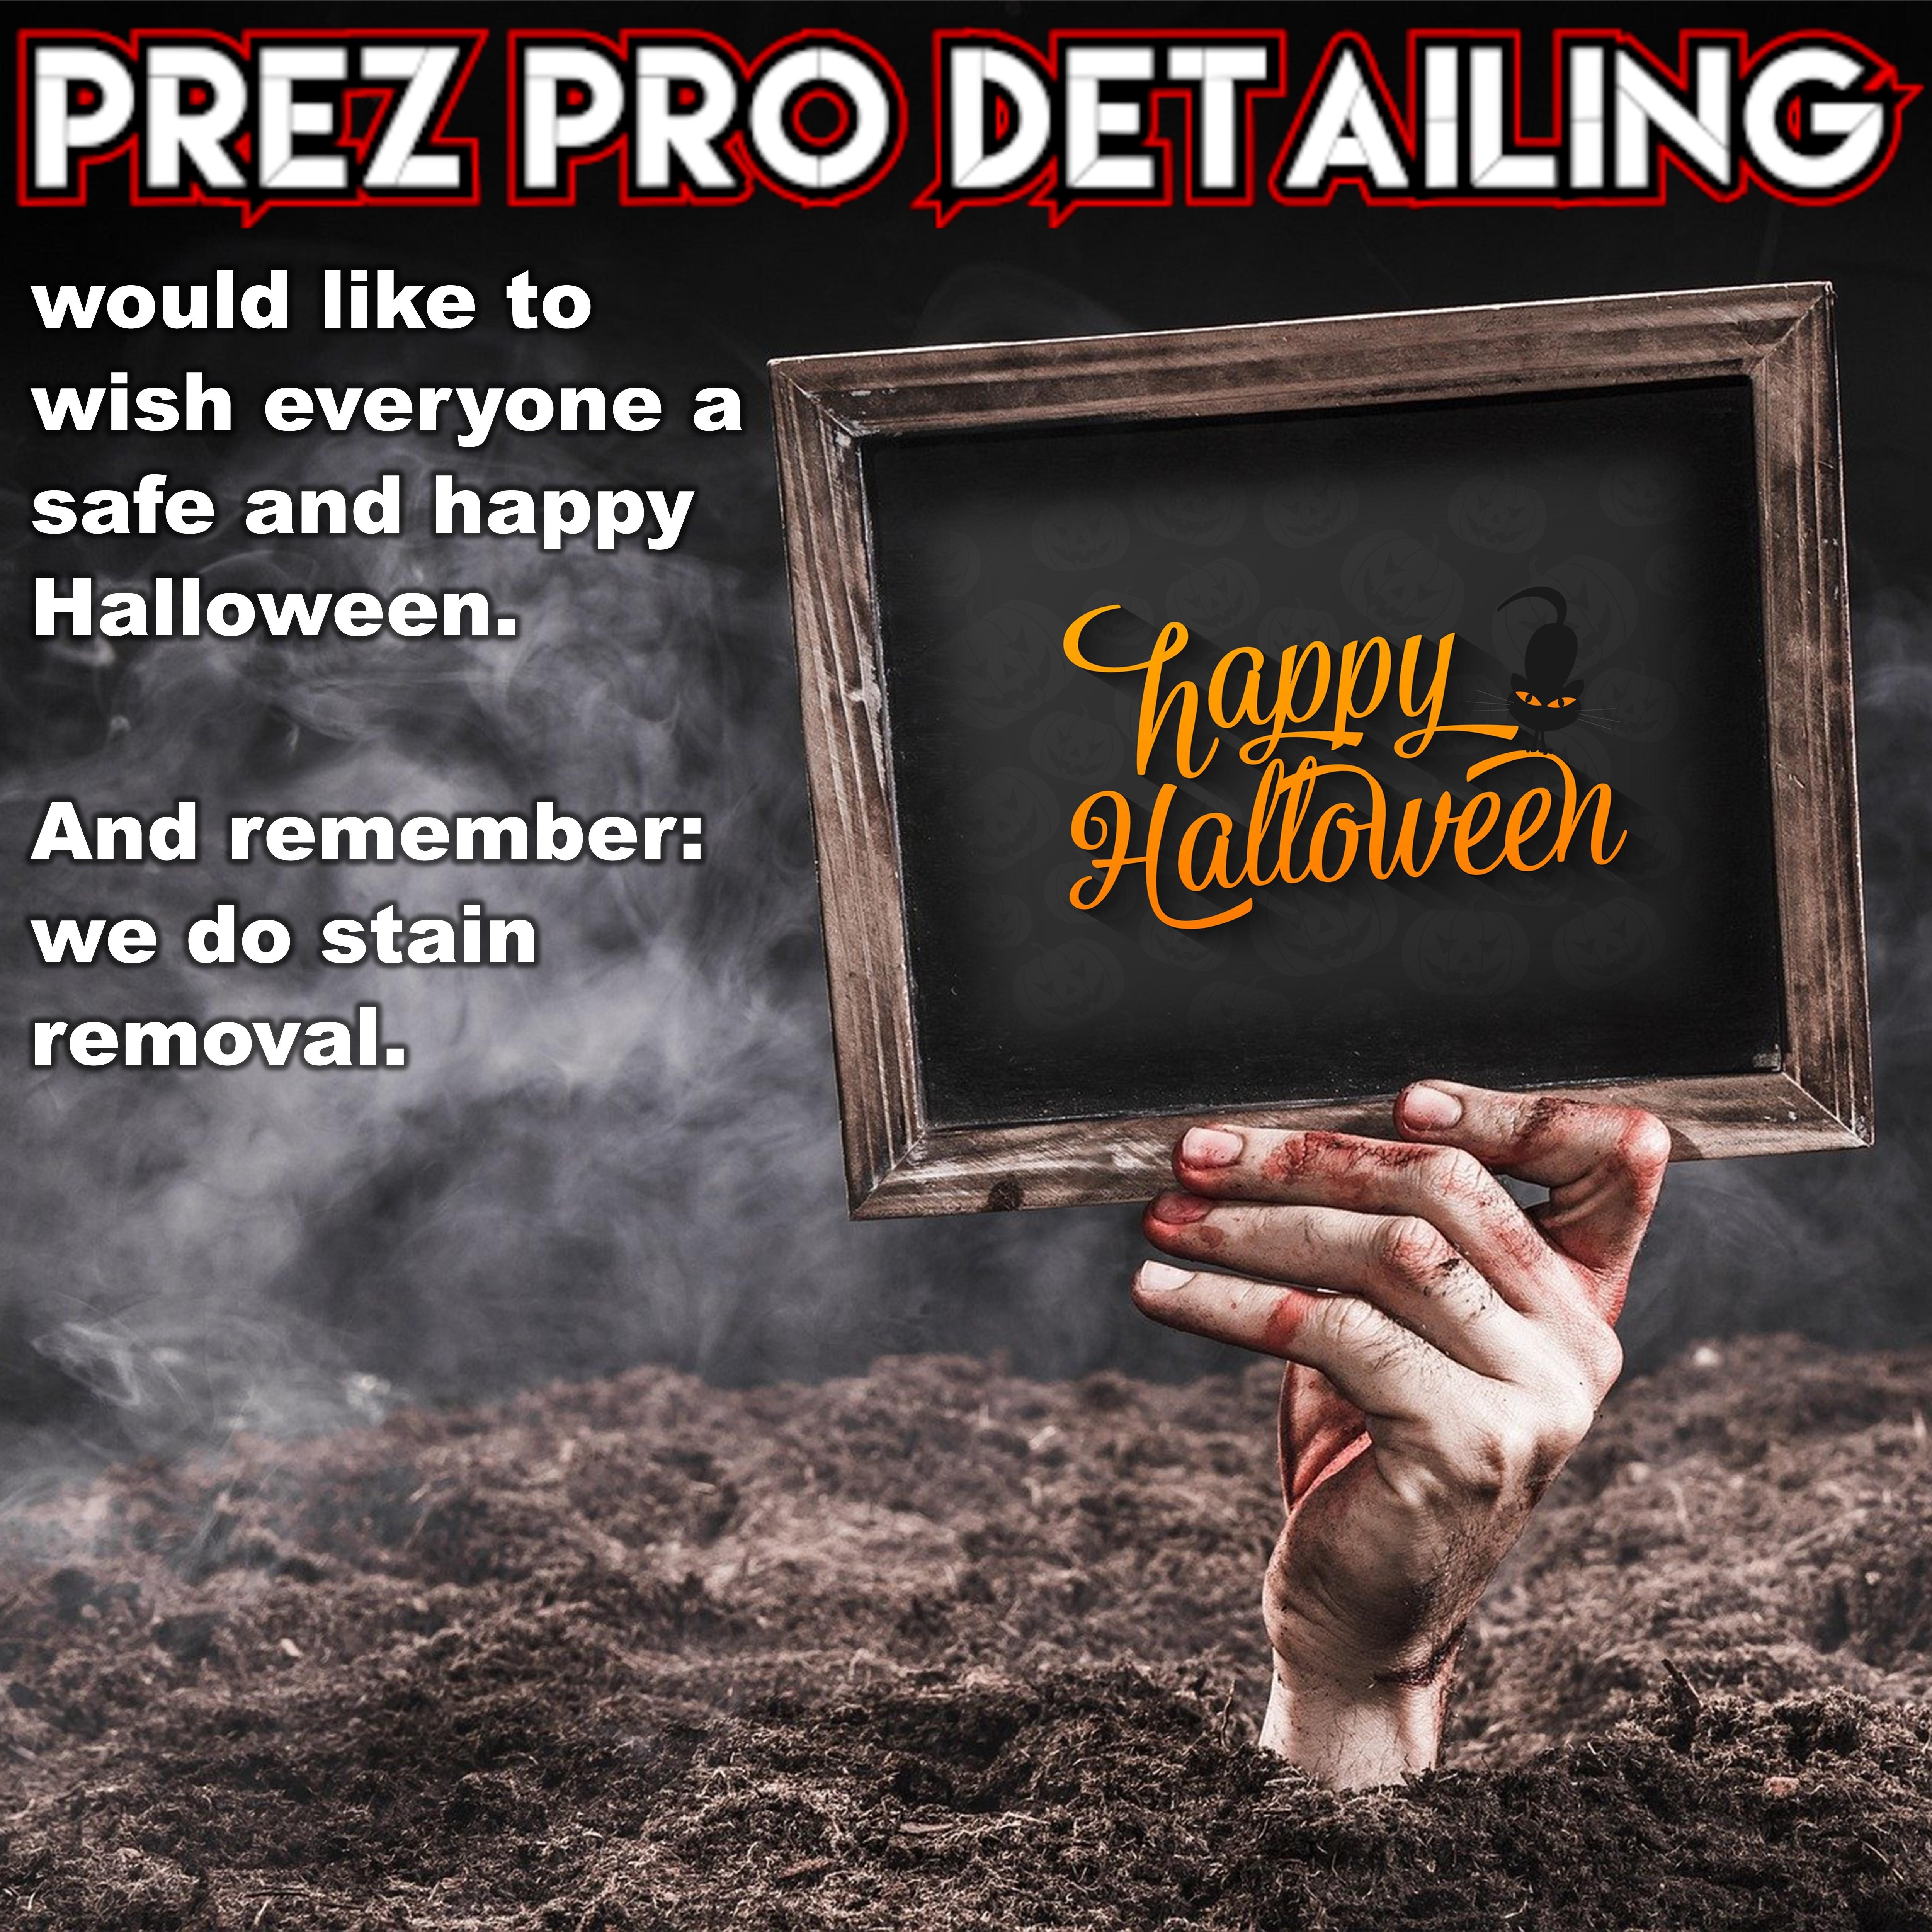 2020.10.19 - Prez Pro Detailing - Facebook Post - Halloween